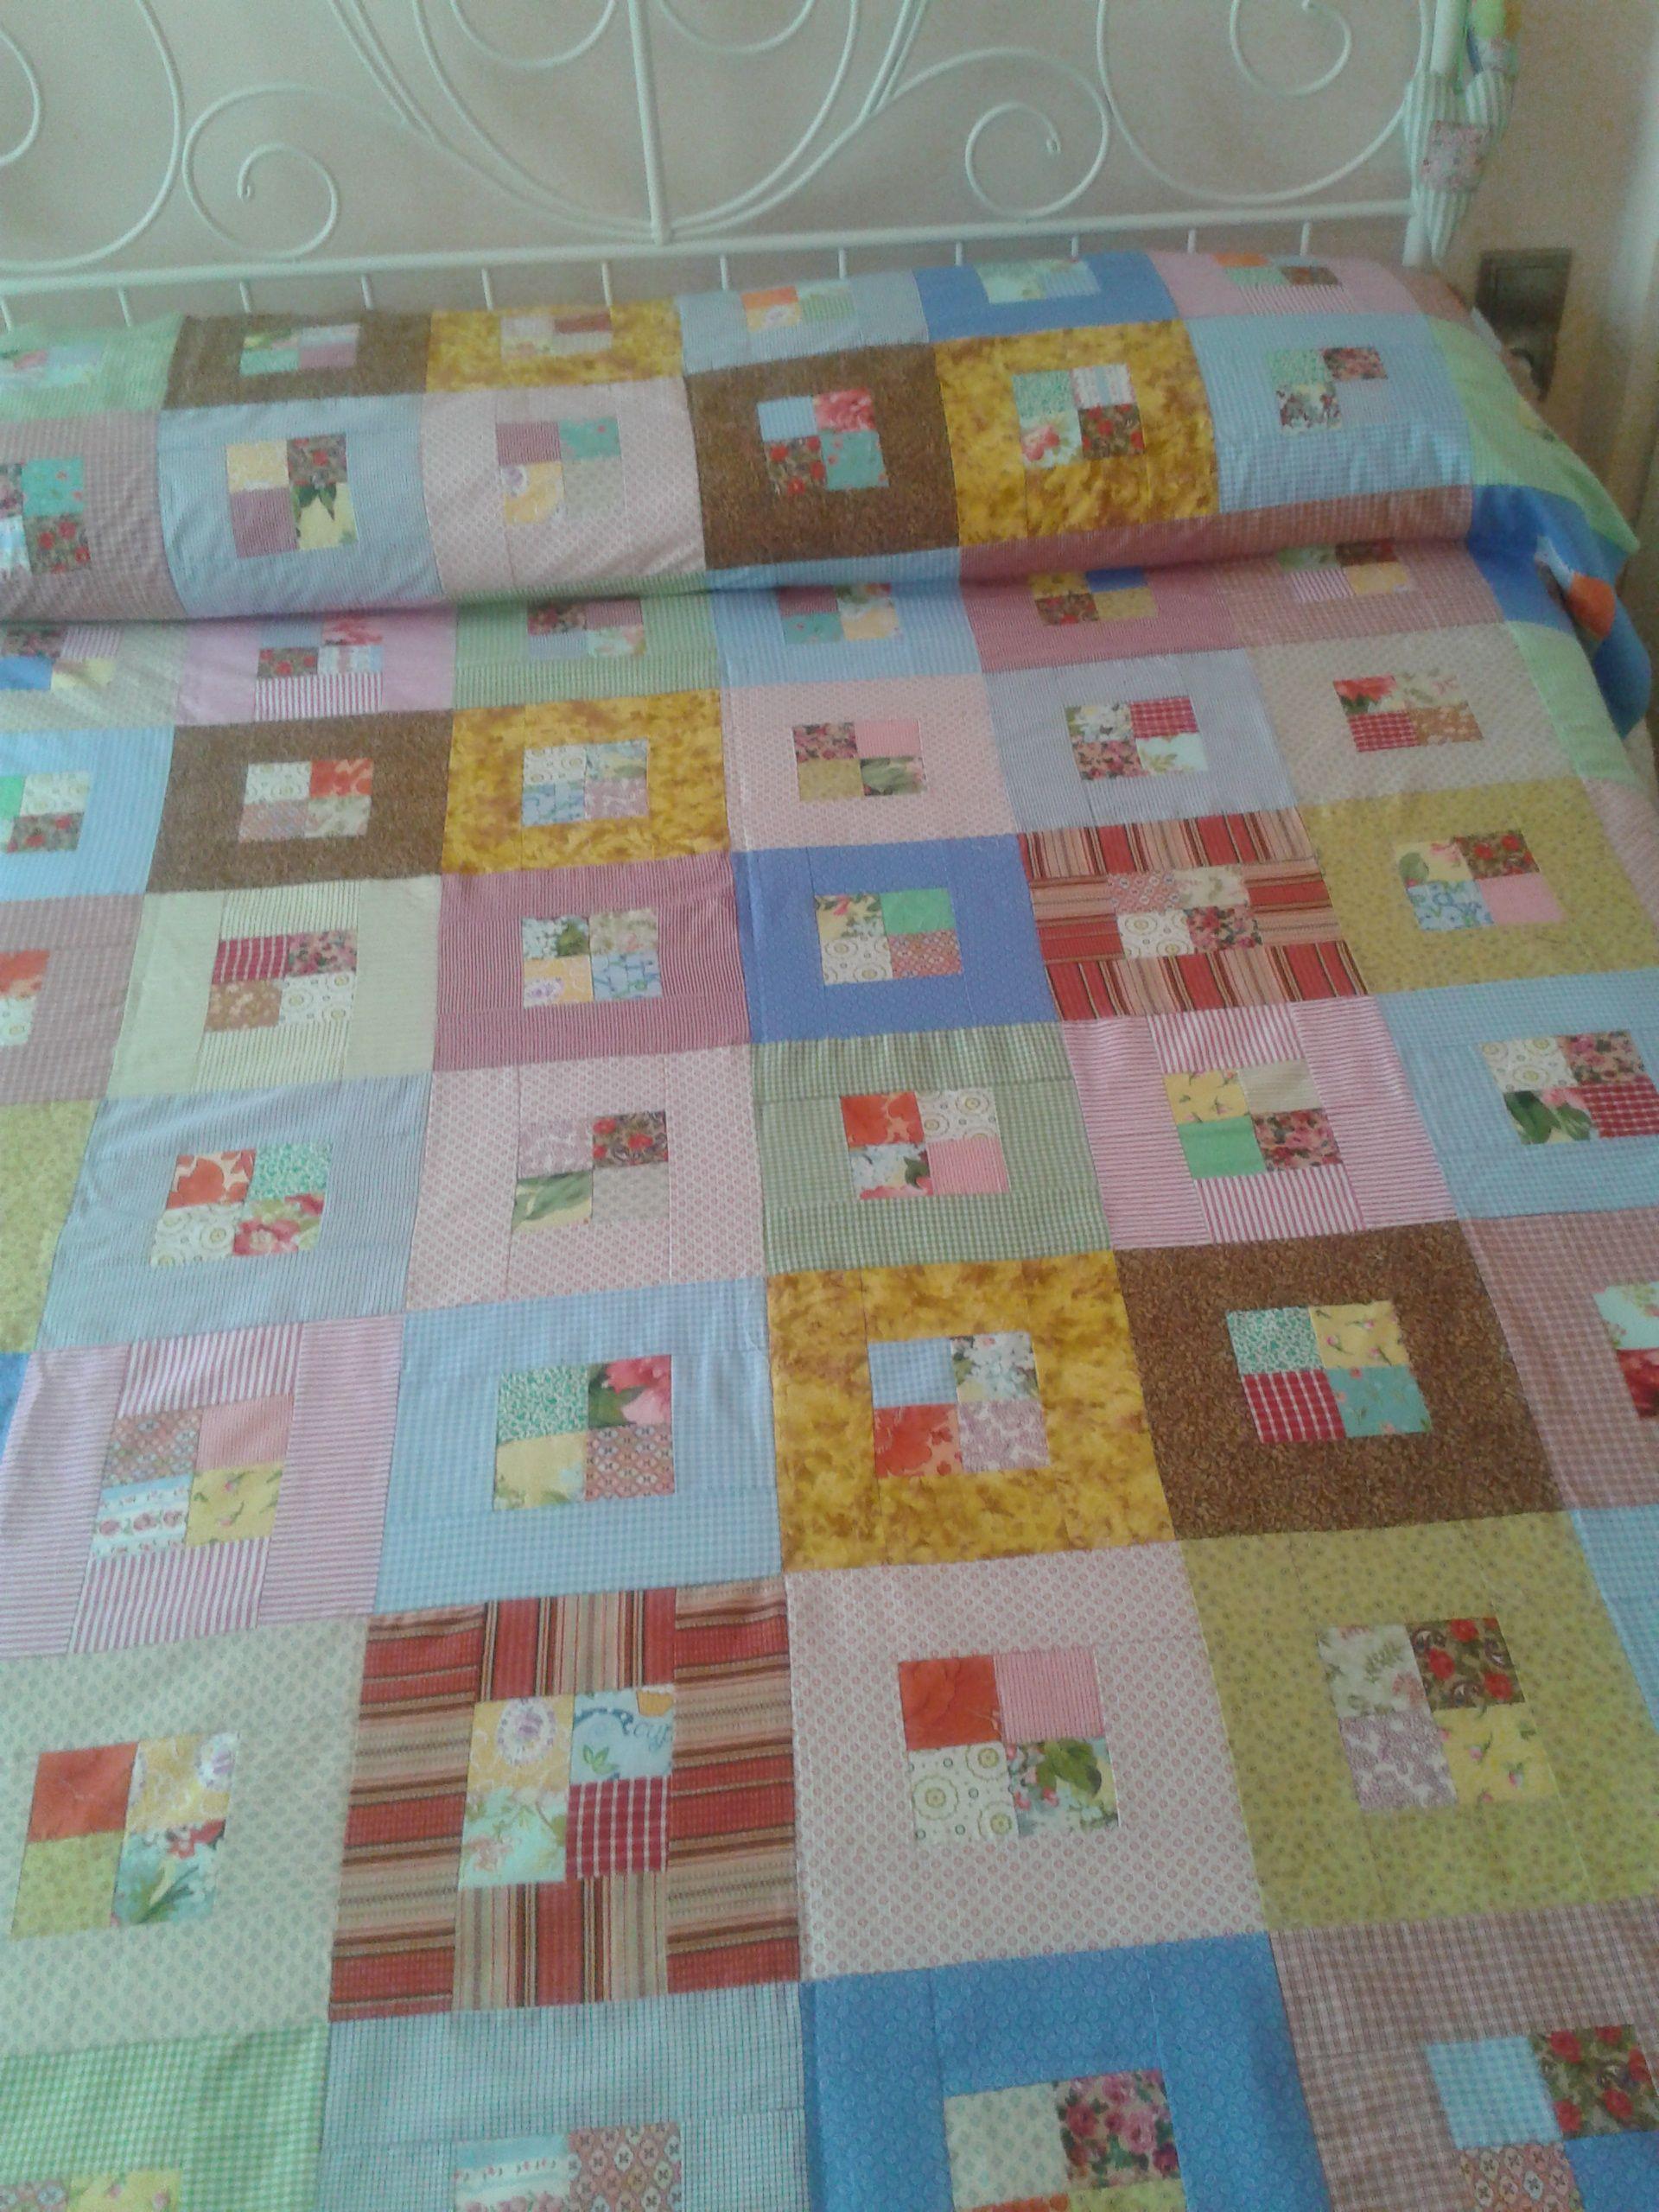 Patchwork bed sheets patterns - Colcha De Patchwork